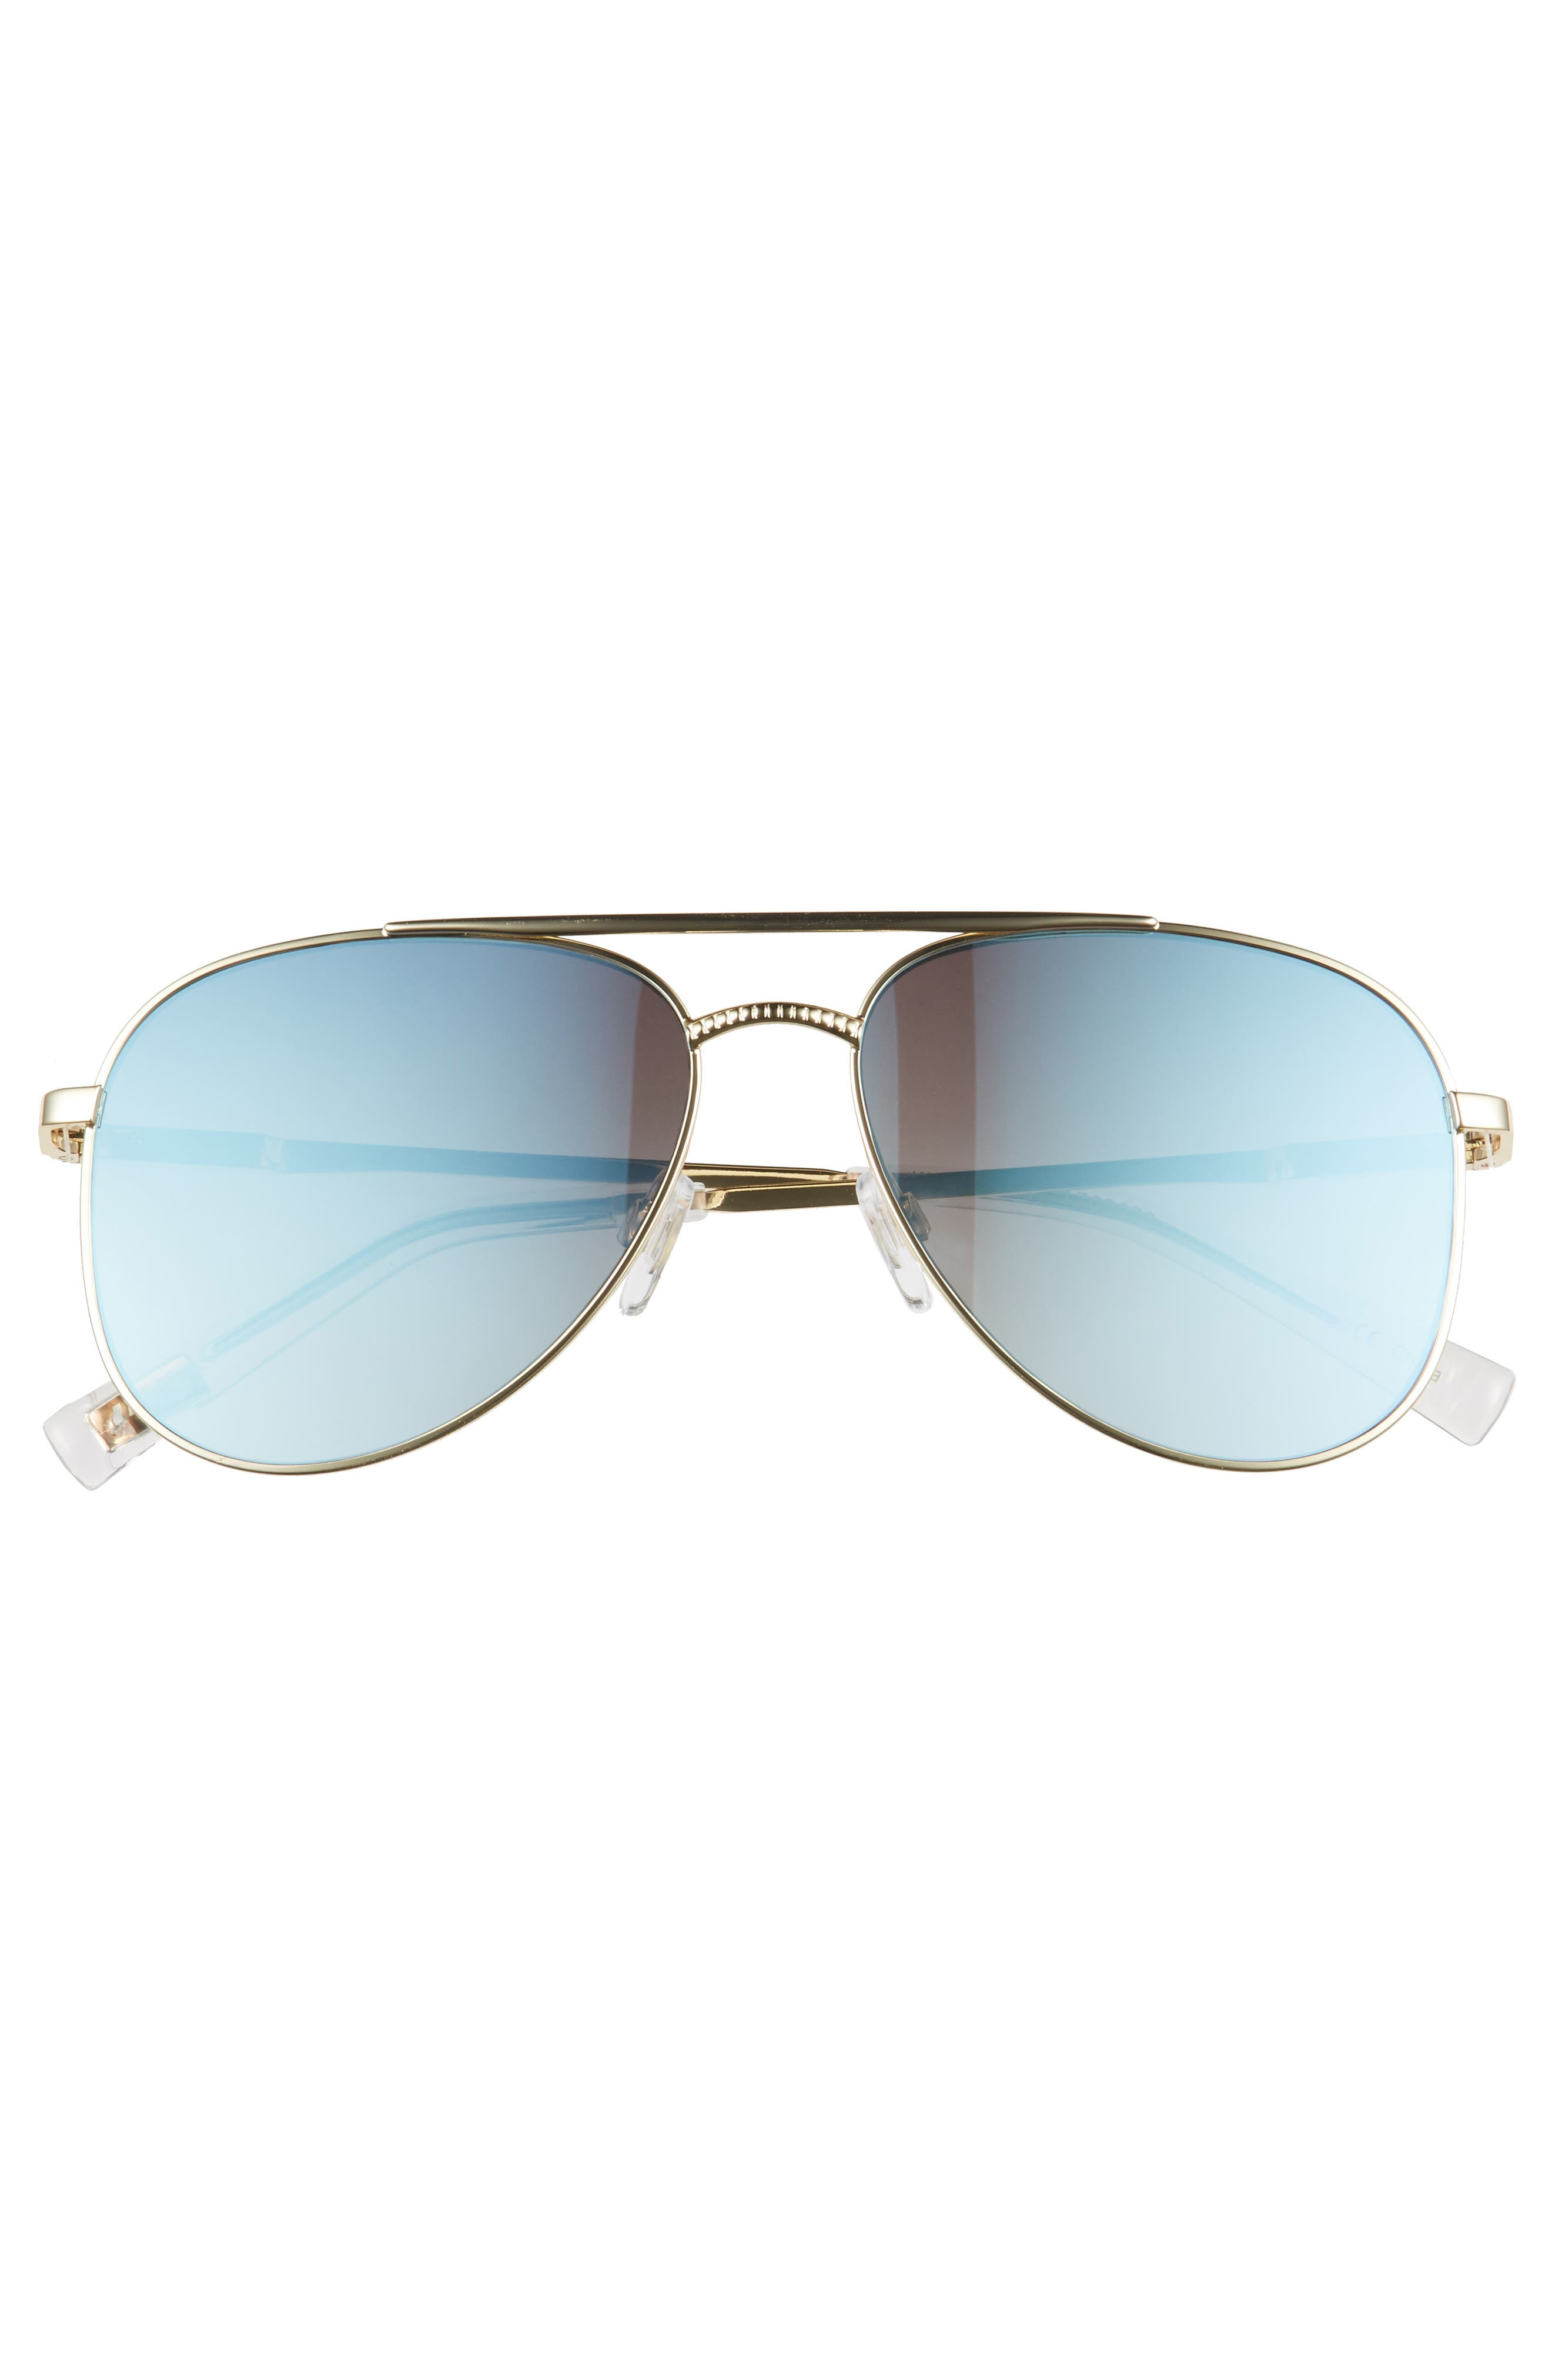 Kingdom 57mm Aviator Sunglasses,                             Alternate thumbnail 3, color,                             Bright Gold